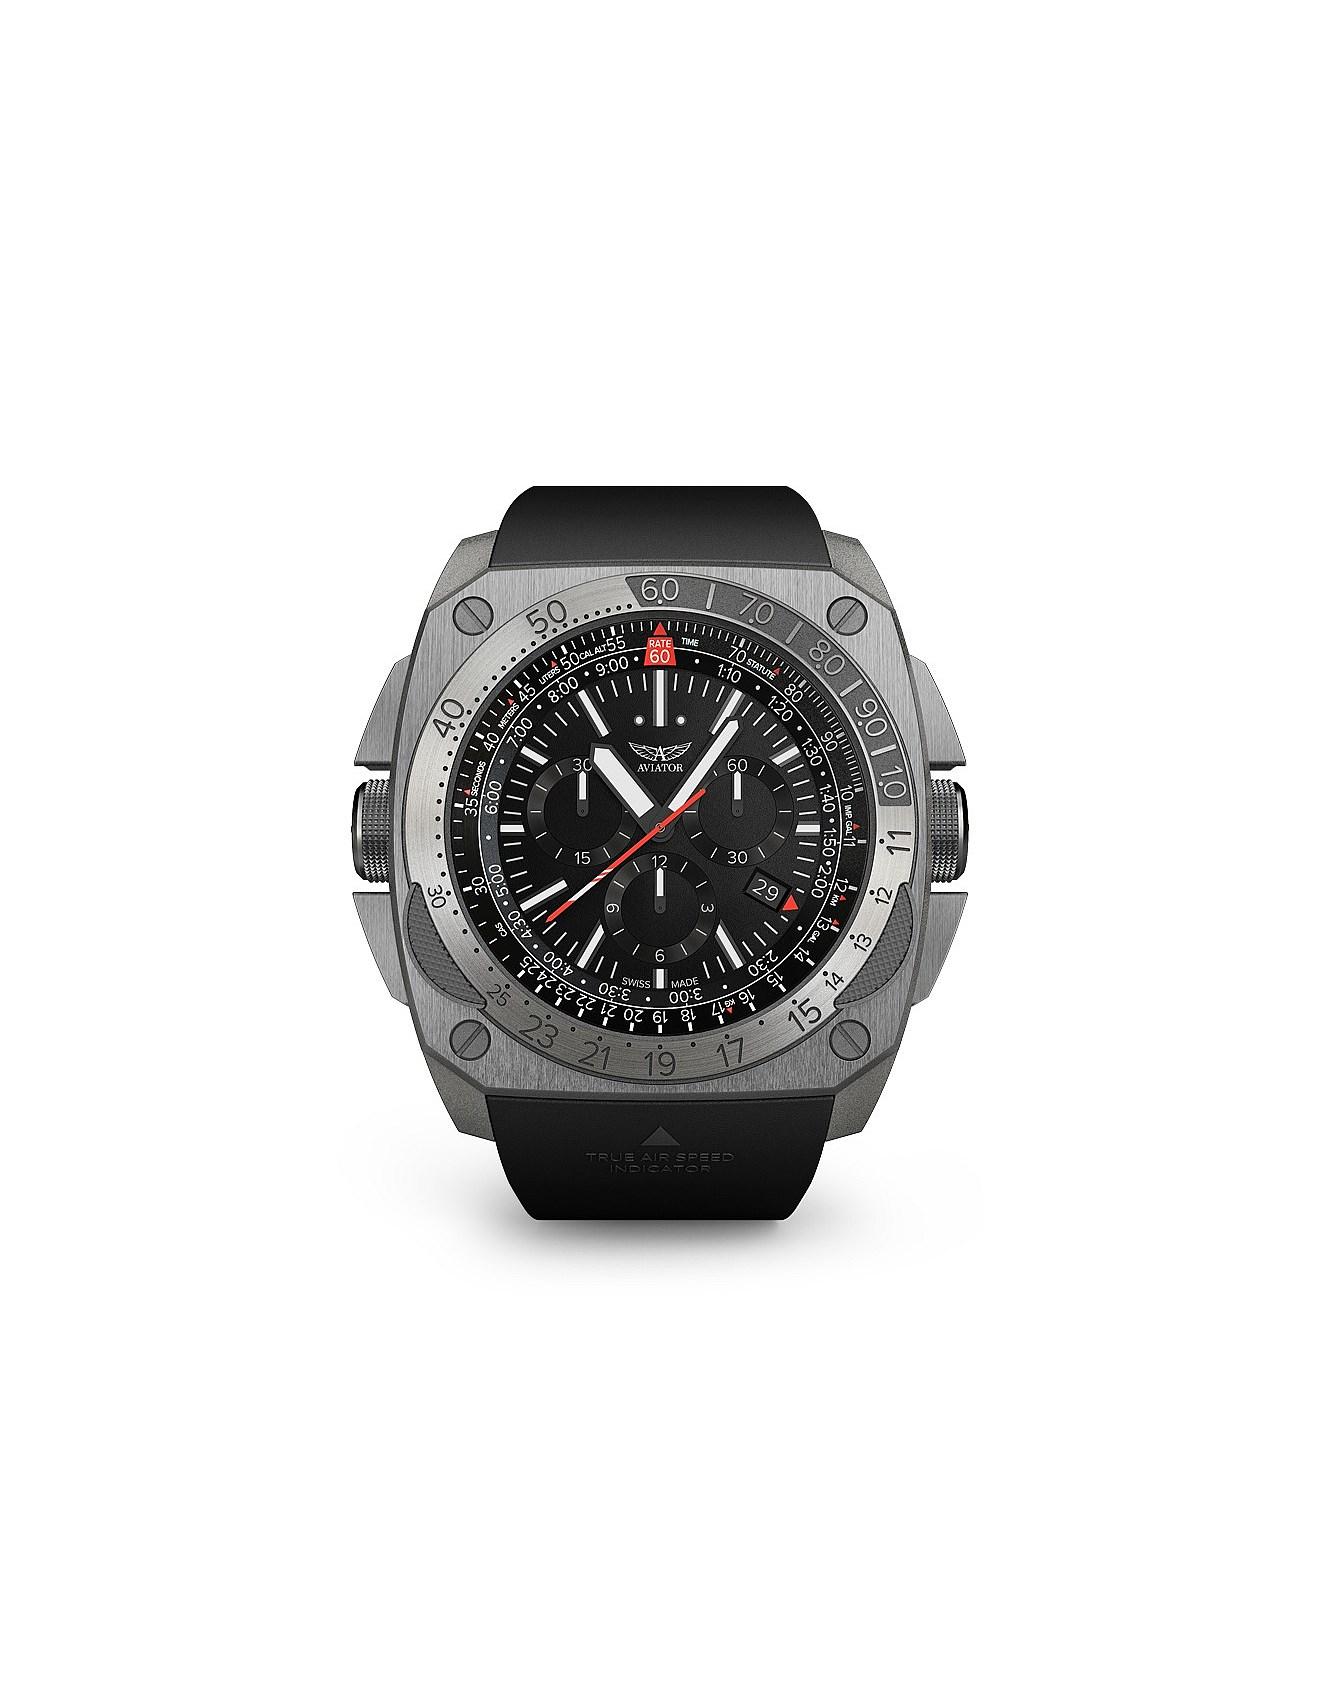 men 39 s watches buy designer watches online david jones aviator chronograph sandblasted watch